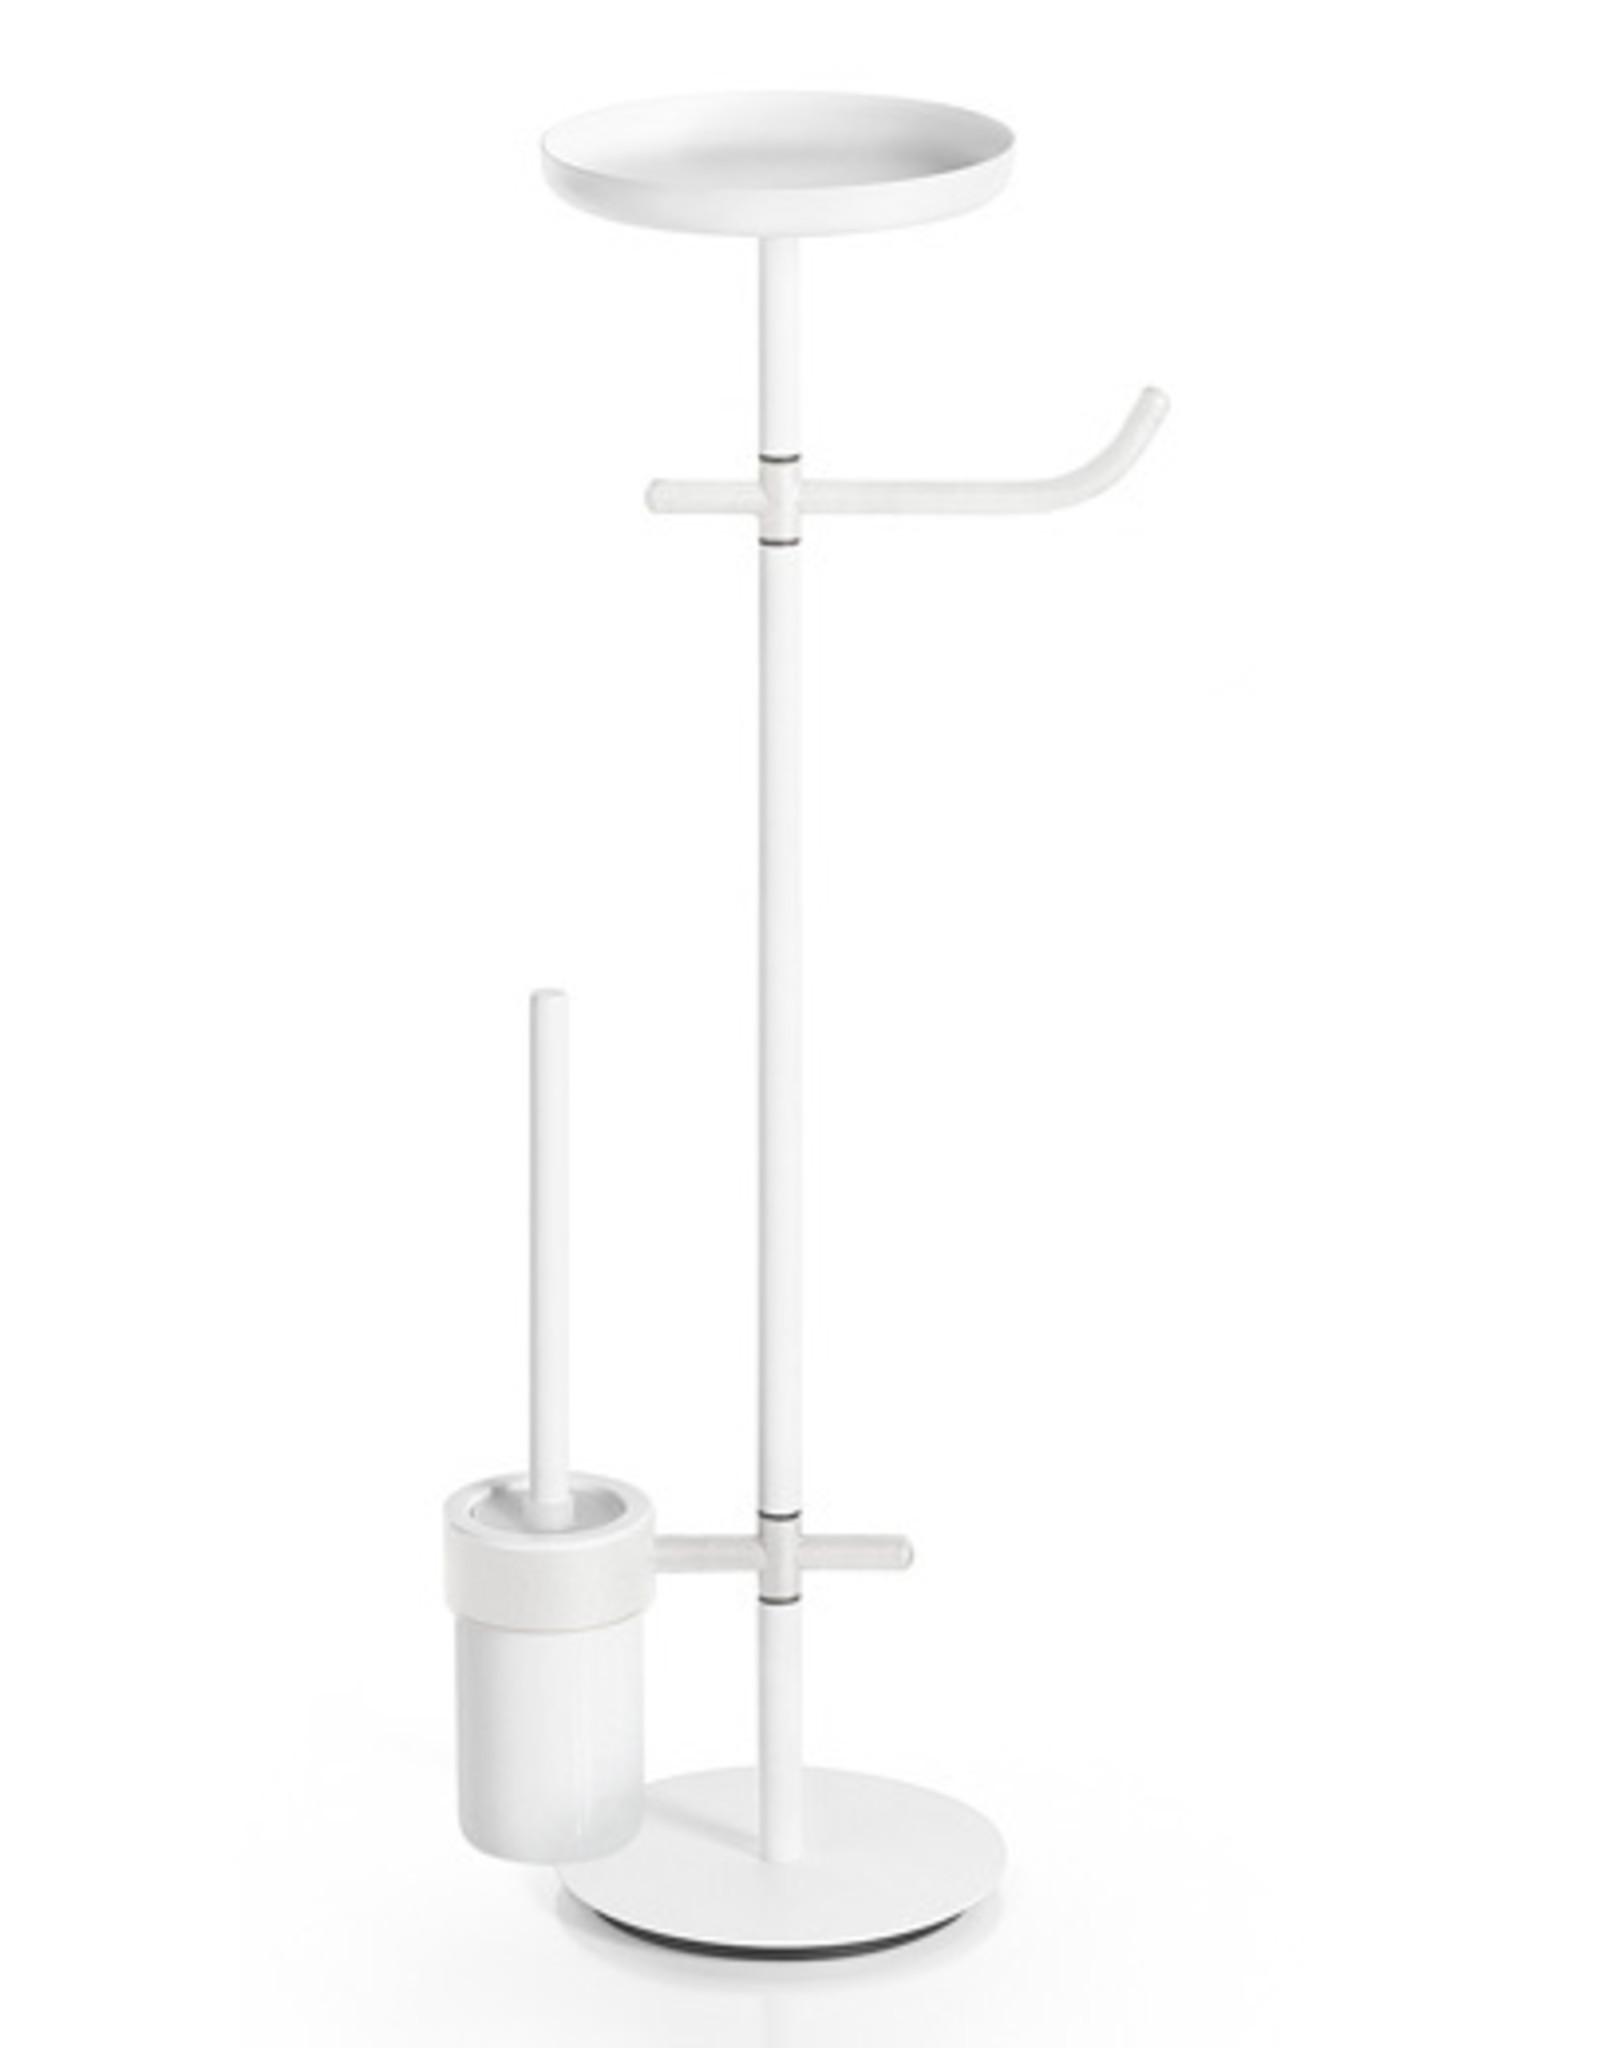 Ranpin toilet set stand, round, white- outlet